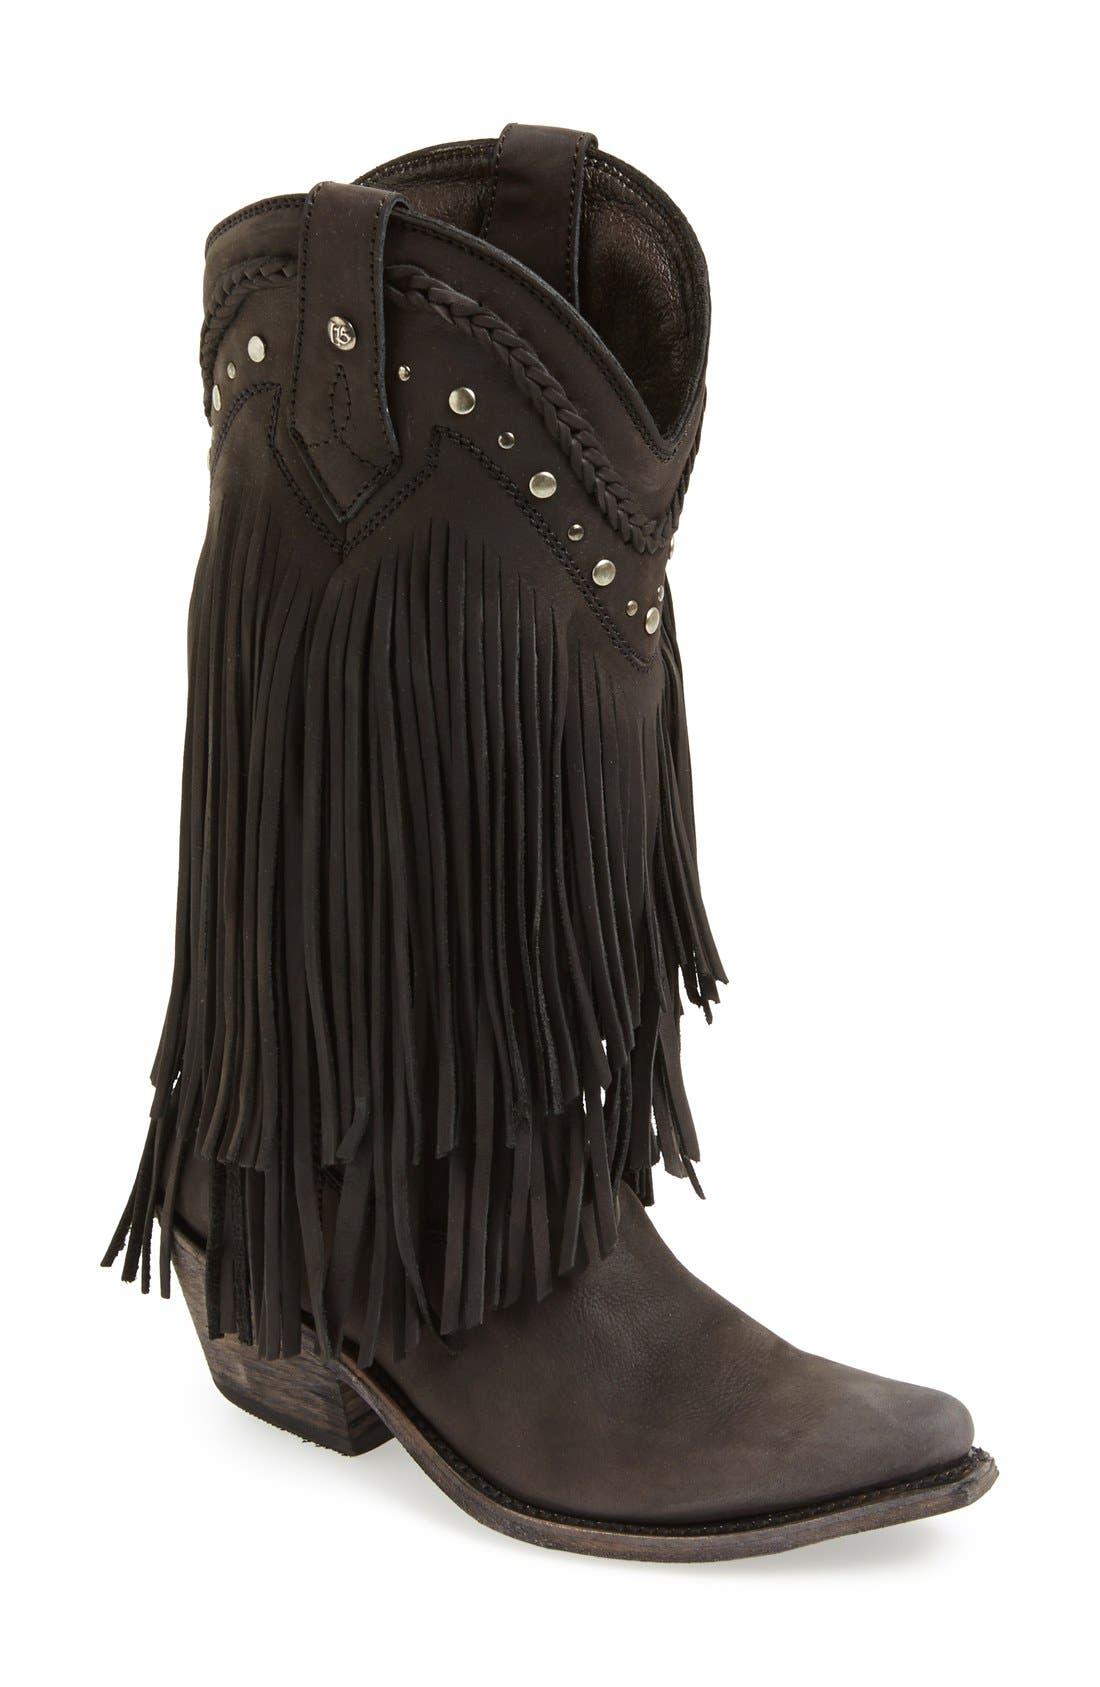 Alternate Image 1 Selected - Liberty Black Tall Fringe Boot (Women)